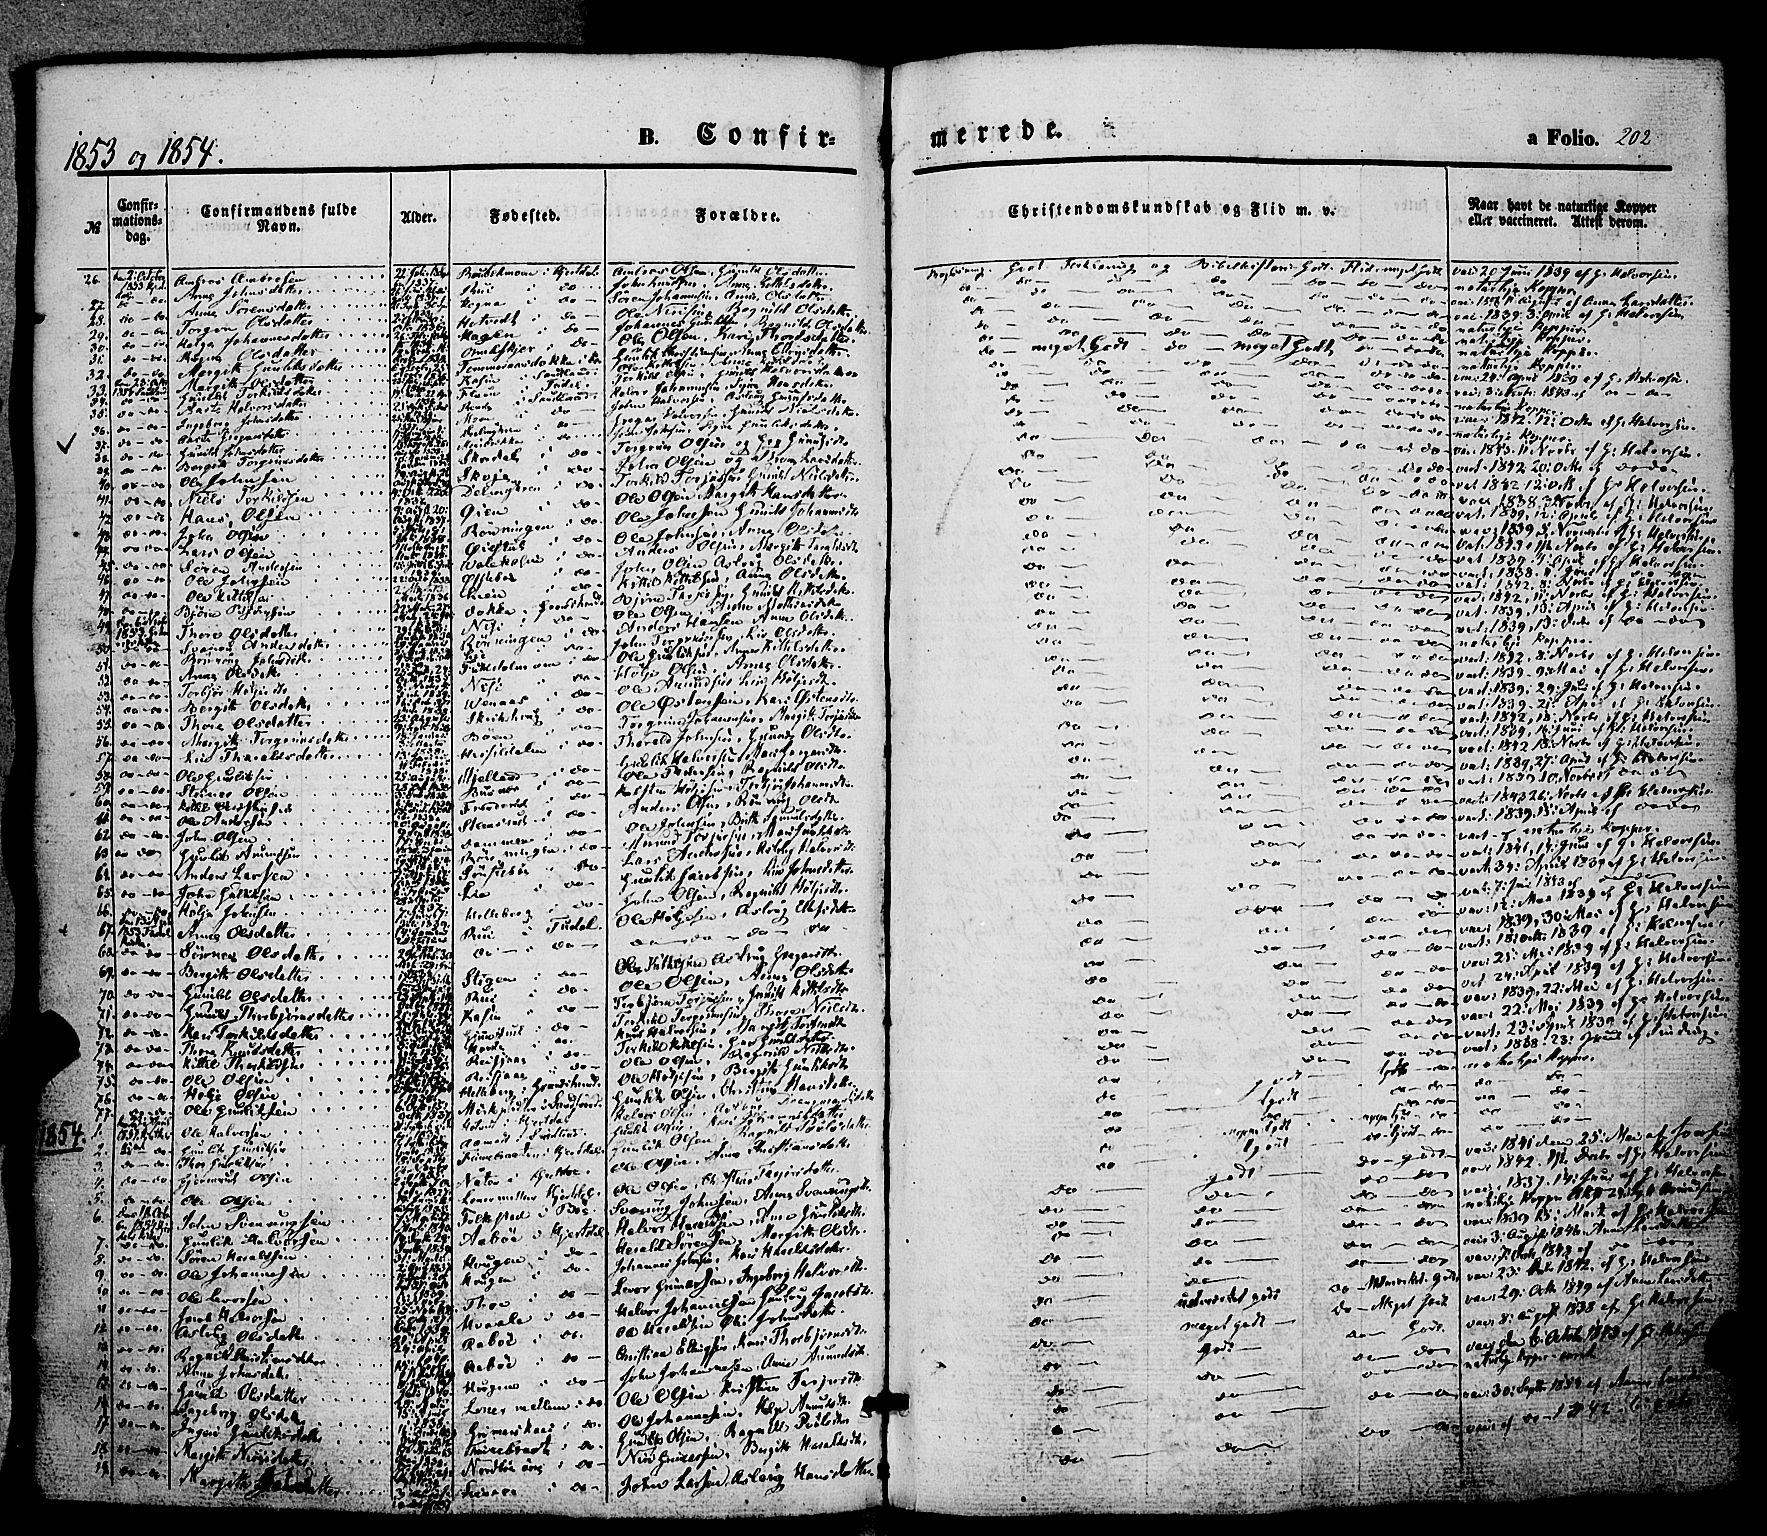 SAKO, Hjartdal kirkebøker, F/Fa/L0008: Ministerialbok nr. I 8, 1844-1859, s. 202